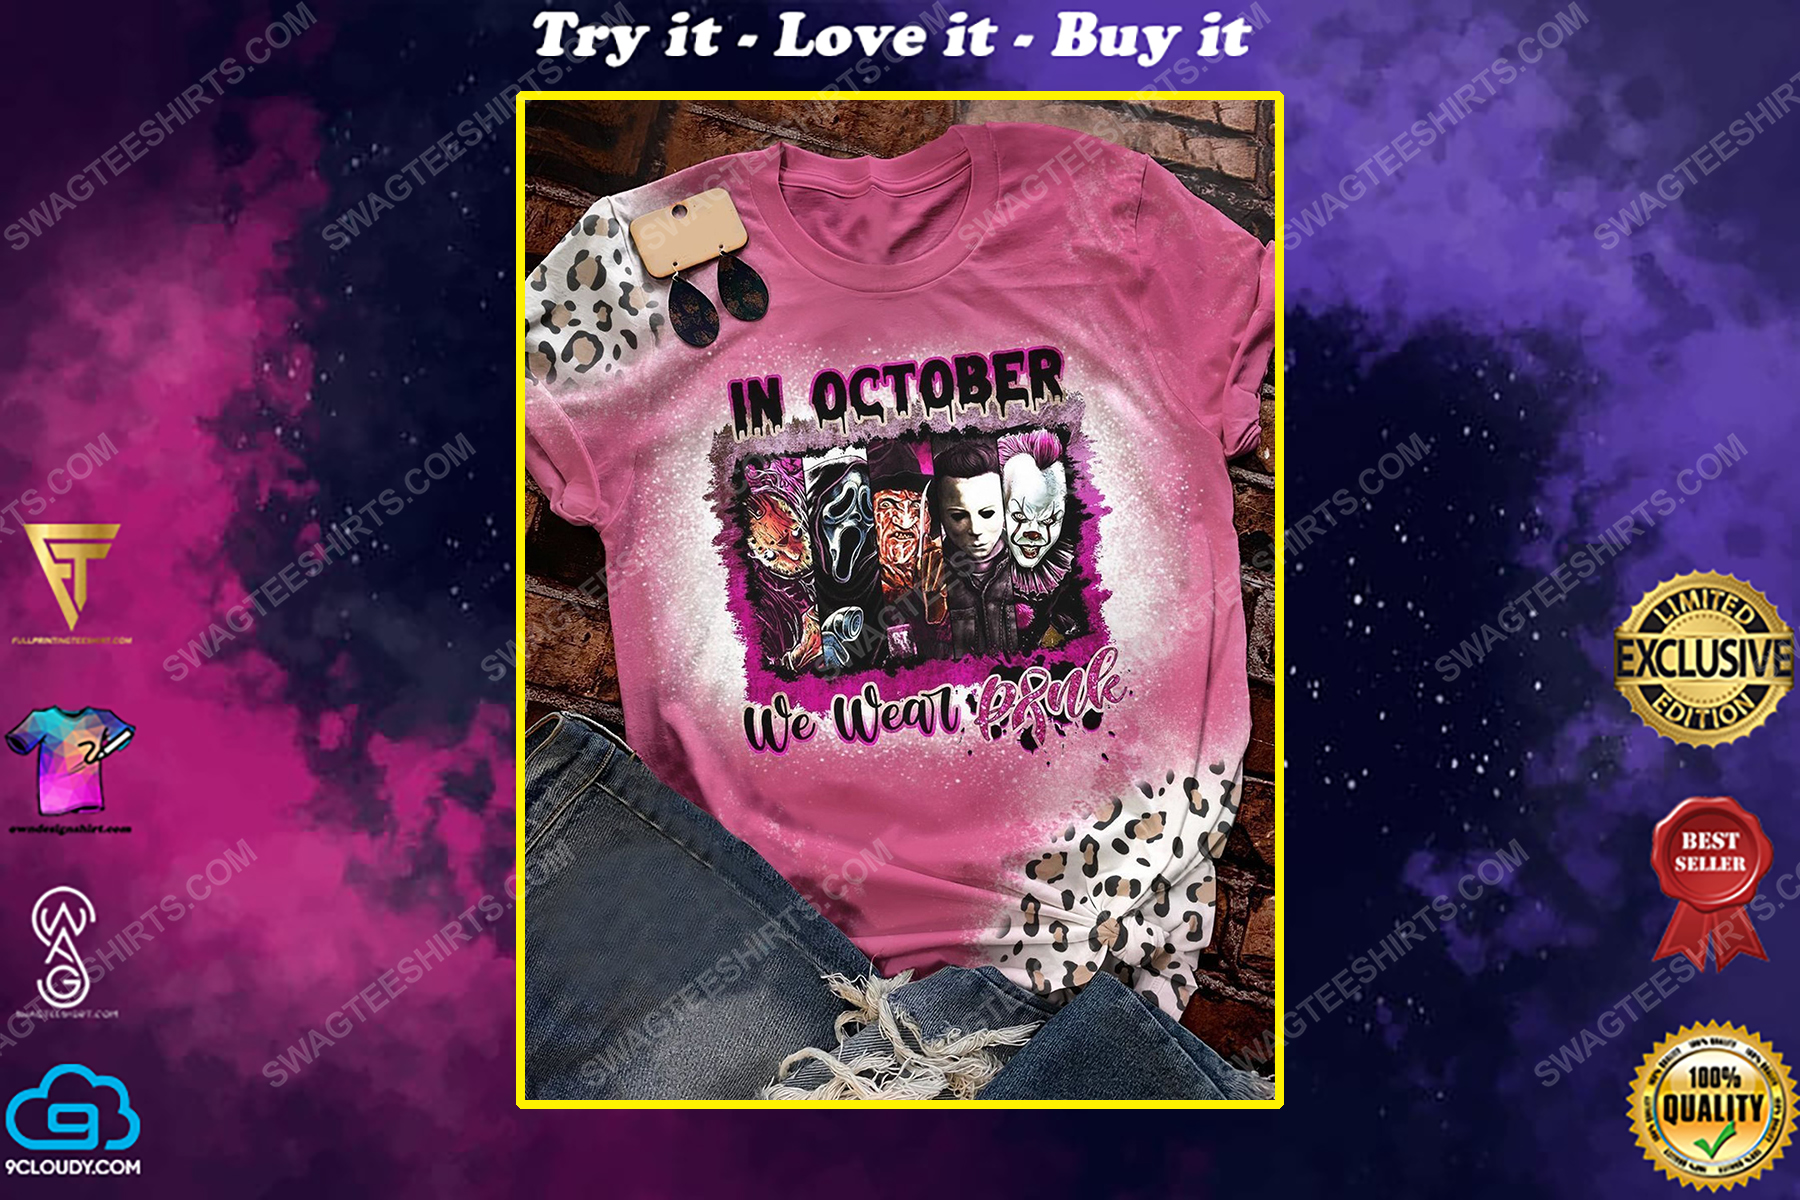 Breast cancer awareness in october we wear pink serial killers shirt